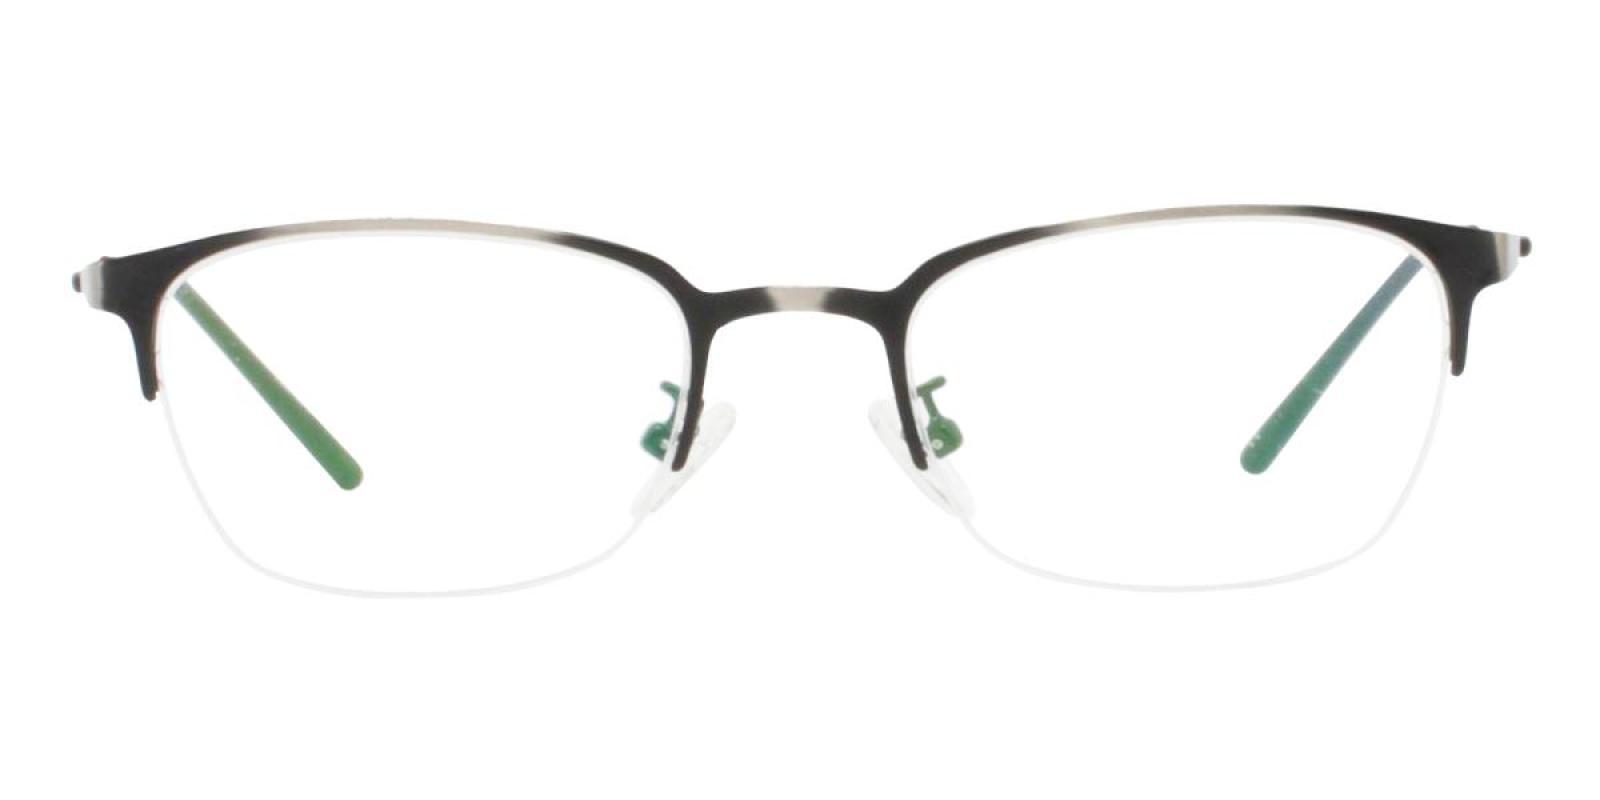 Wavain-Gun-Rectangle-Metal-Eyeglasses-additional2